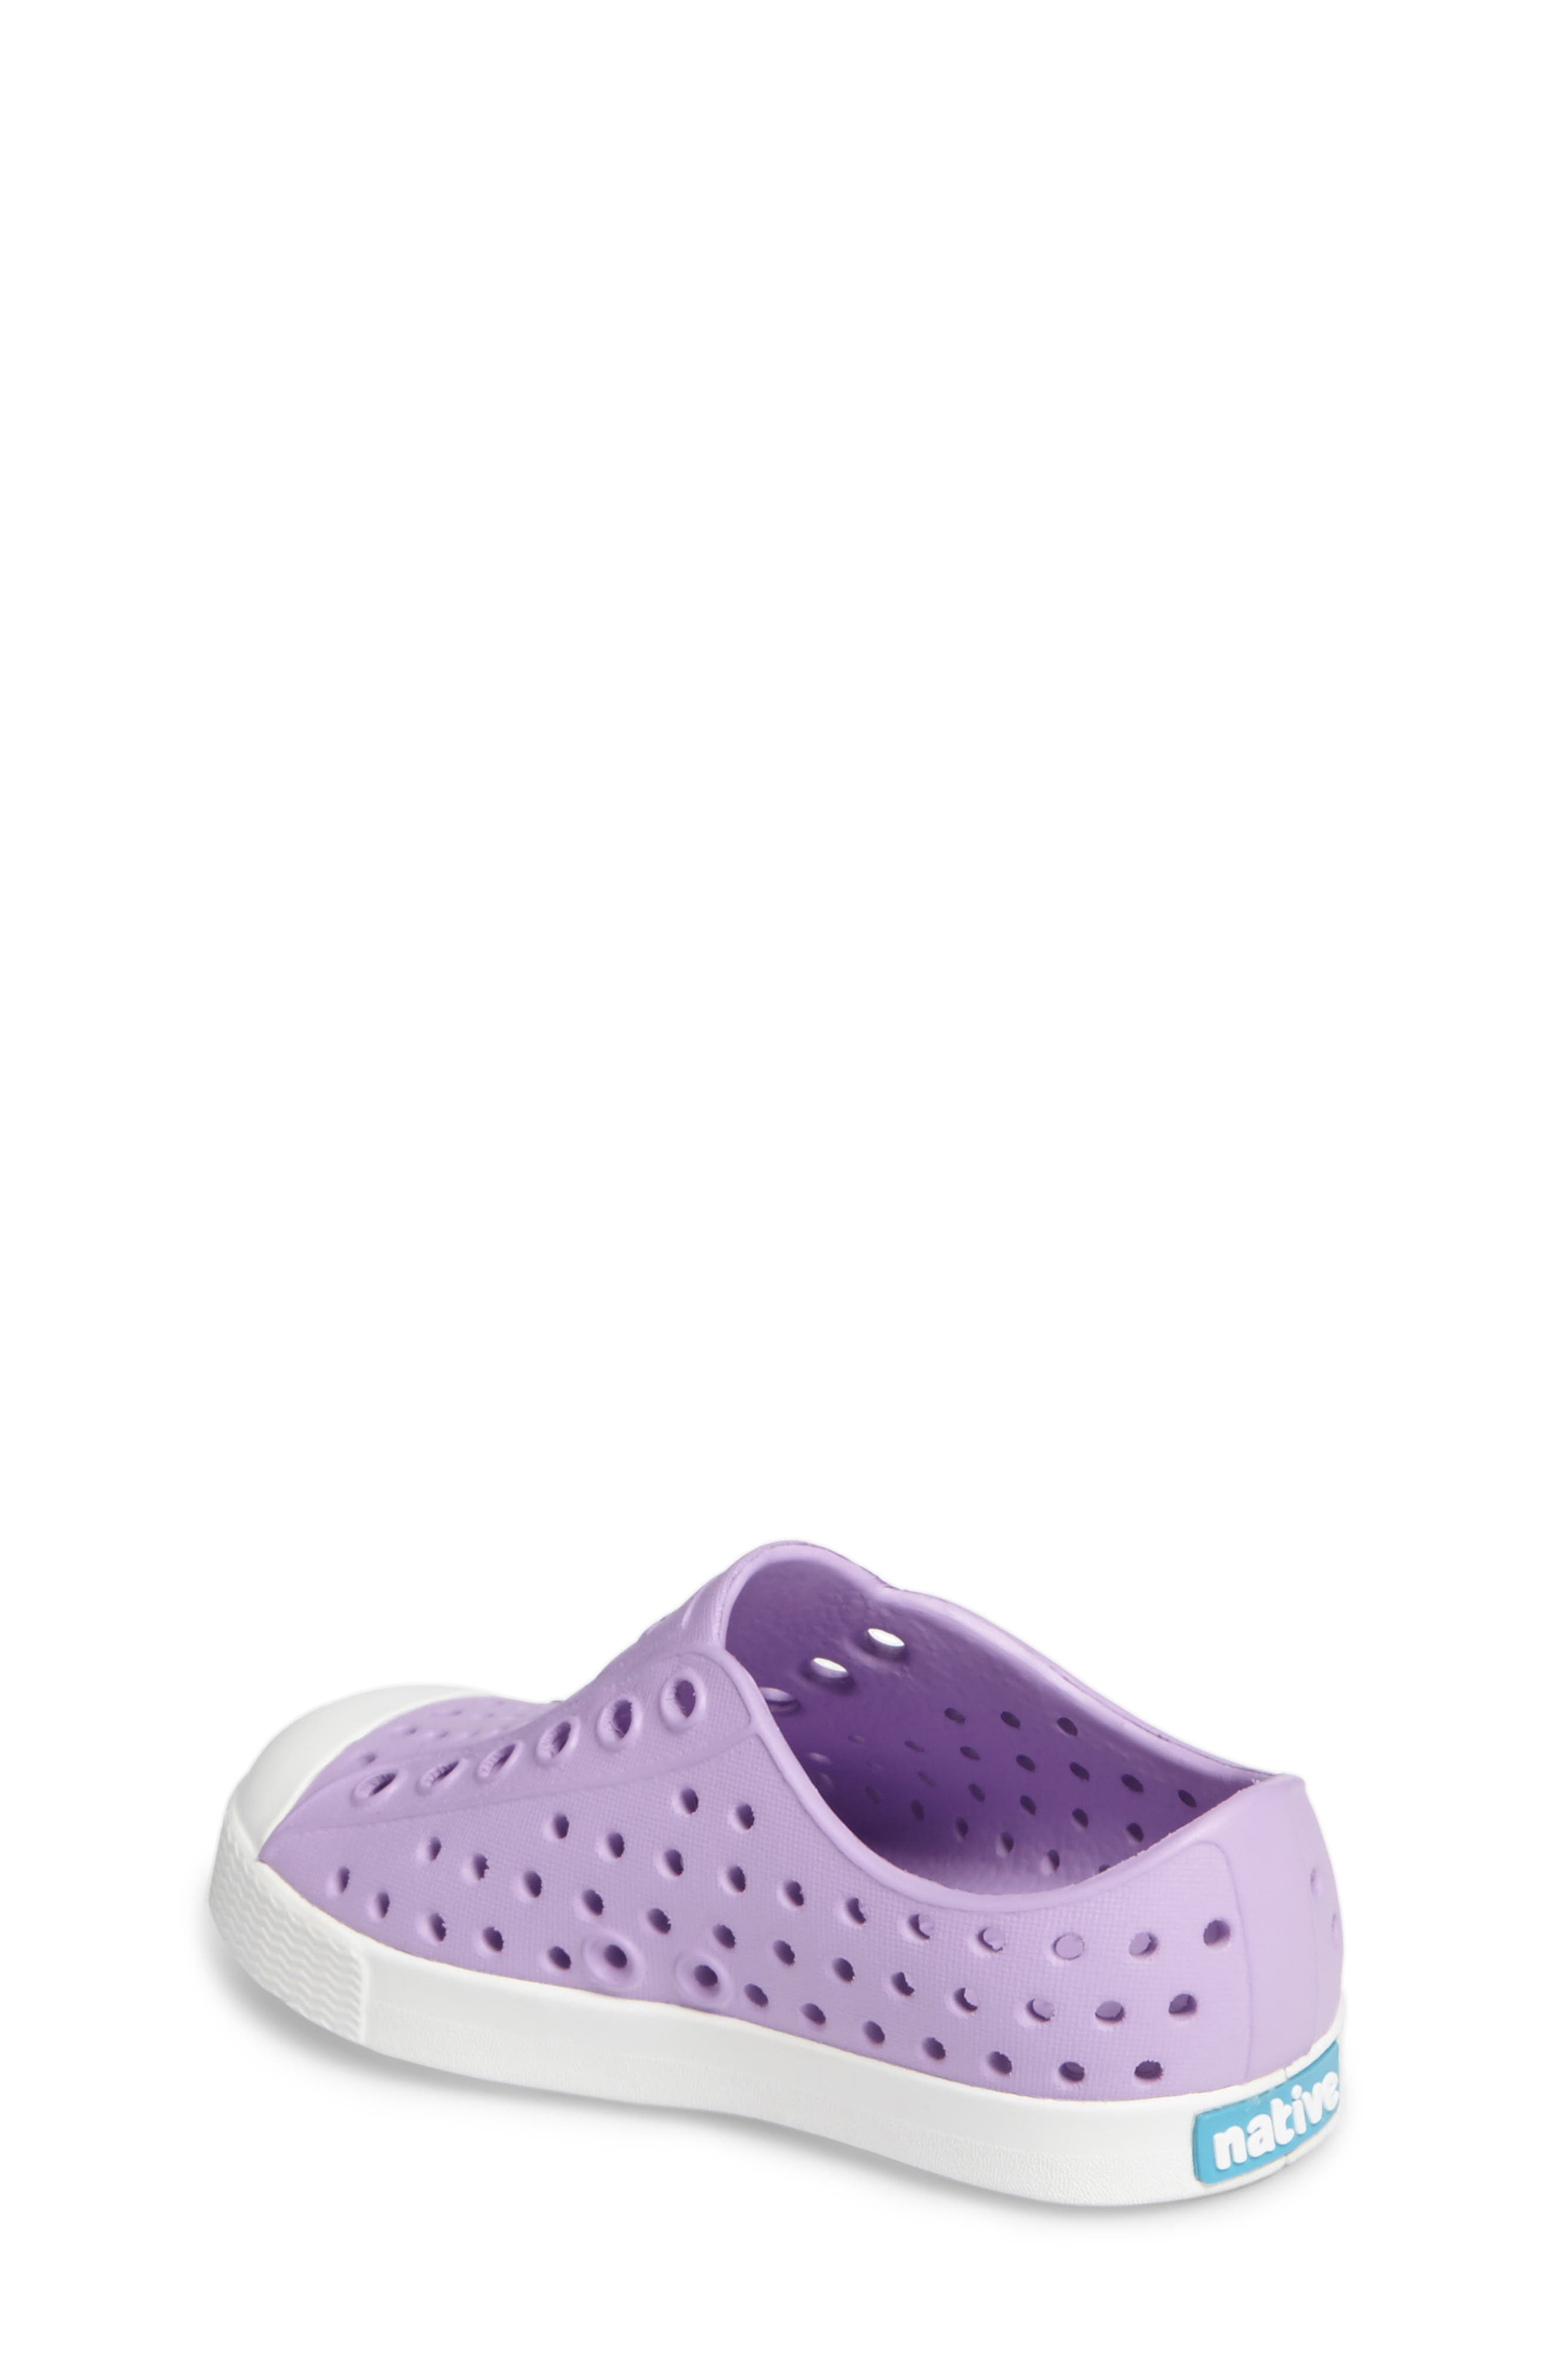 'Jefferson' Water Friendly Slip-On Sneaker,                             Alternate thumbnail 108, color,